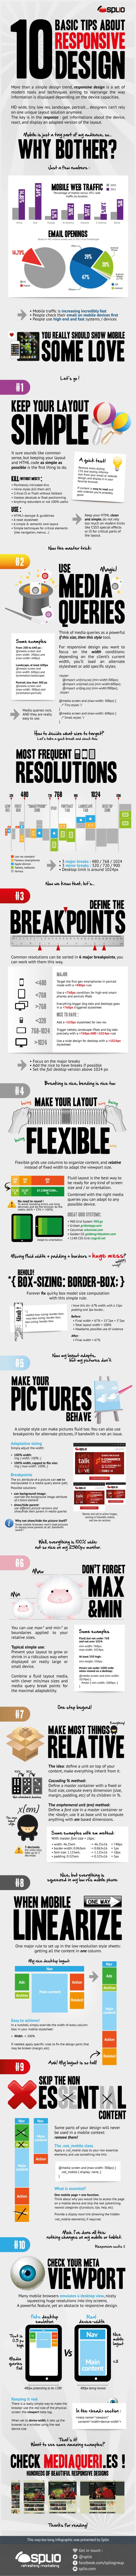 Infographie Responsive Design - AUTOVEILLE